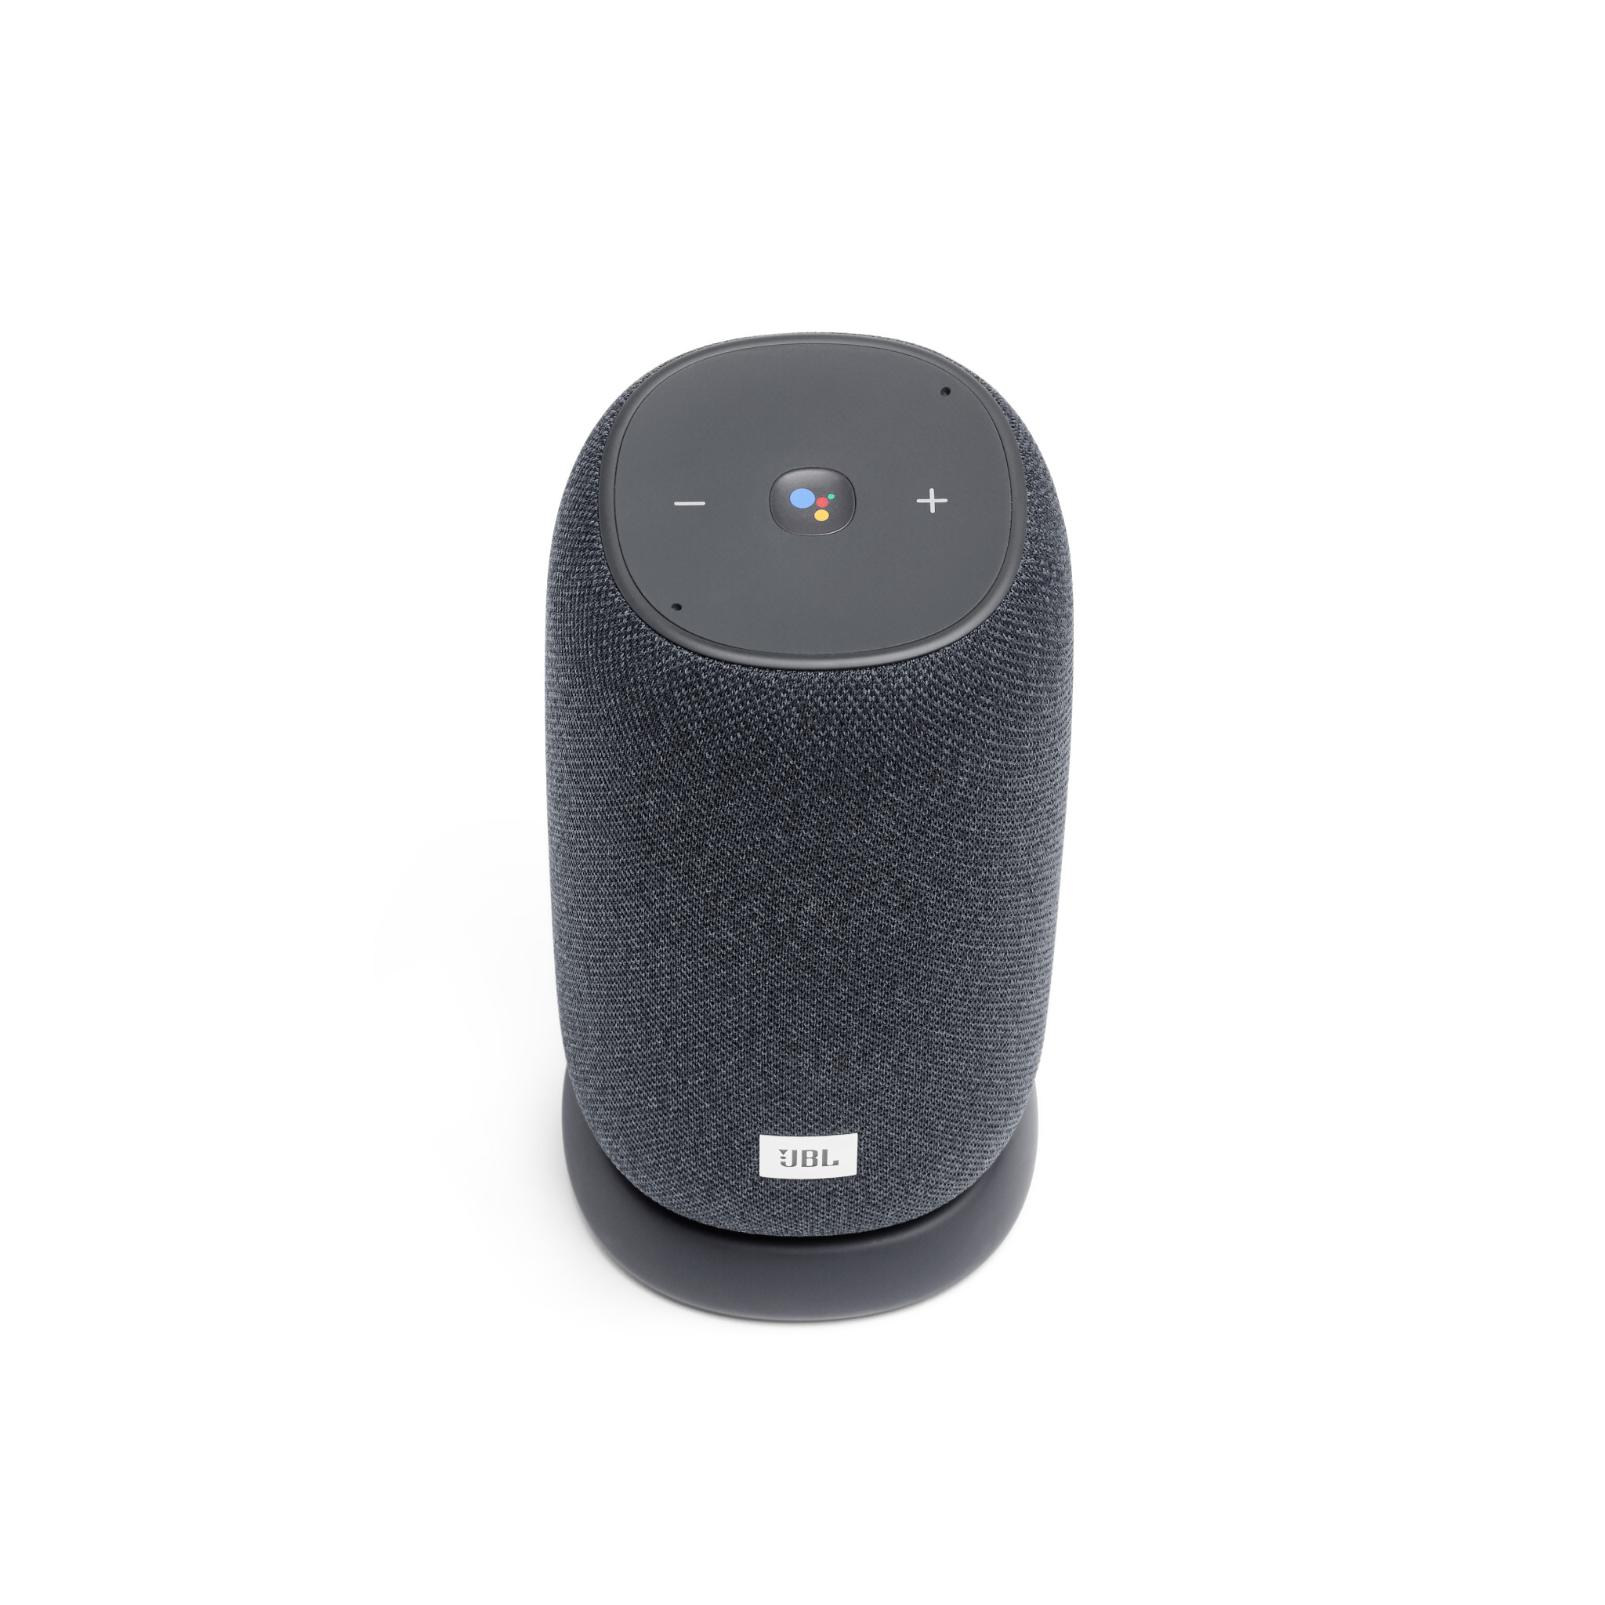 JBL Link Portable - Grey - Portable Wi-Fi Speaker - Front